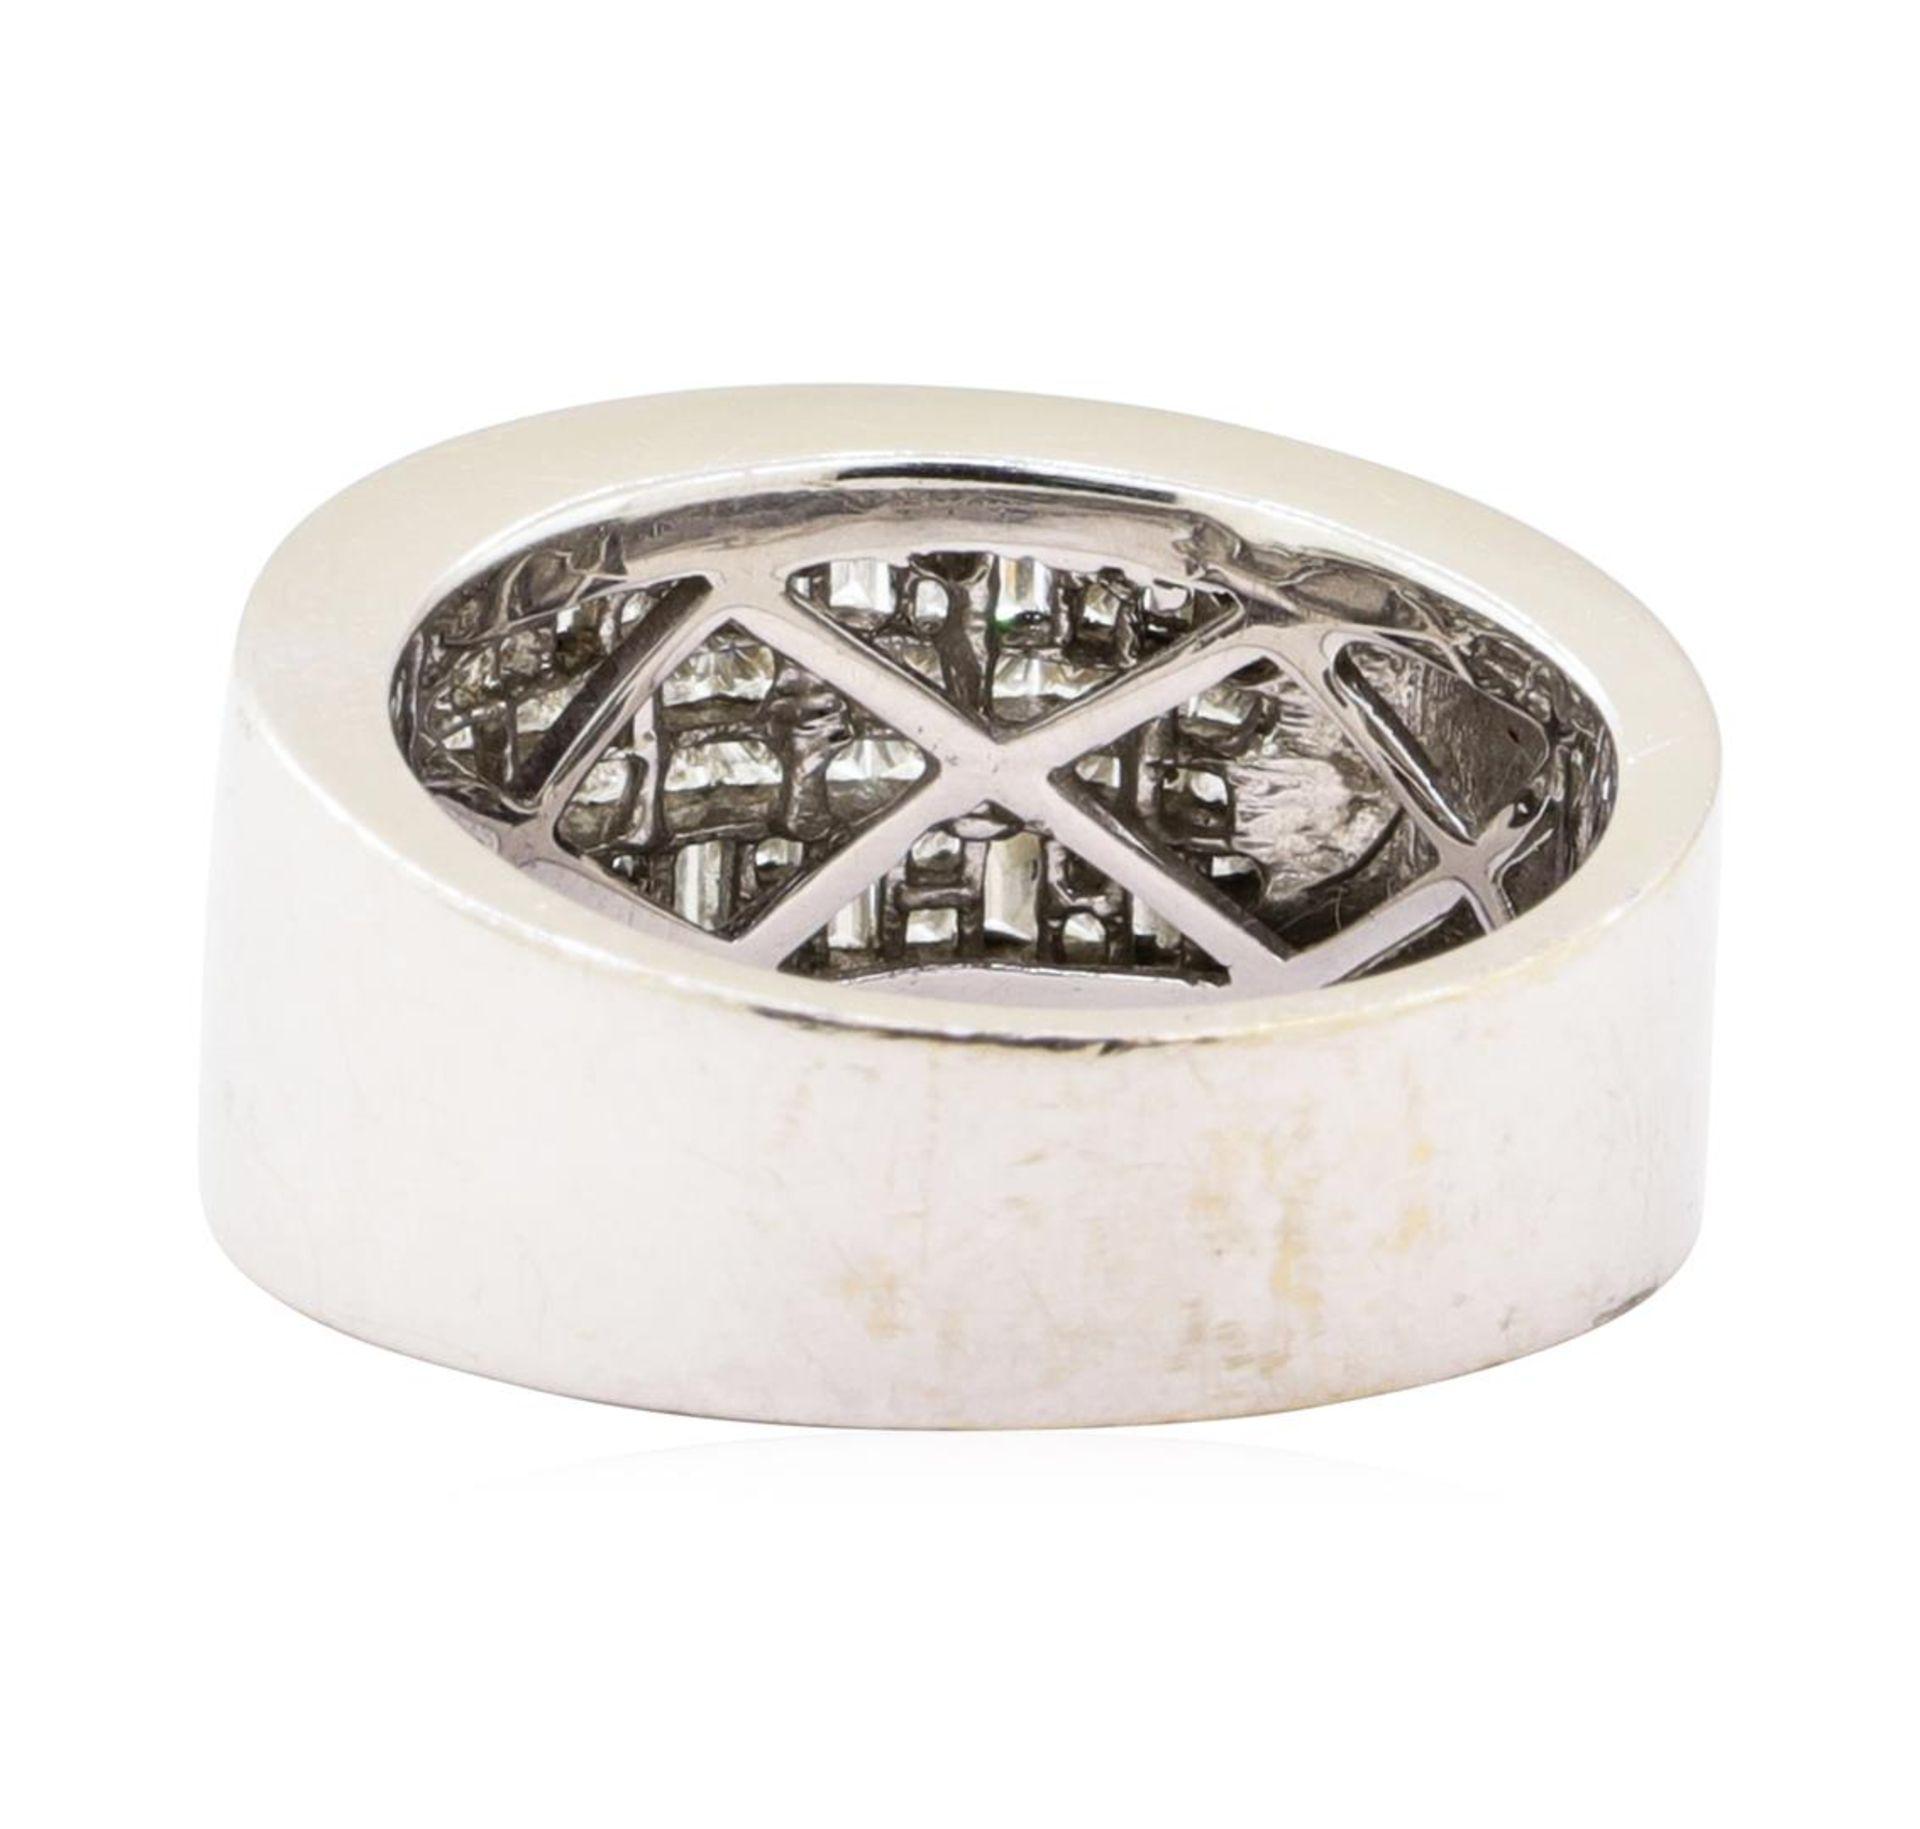 1.07 ctw Diamond Ring - 18KT White Gold - Image 3 of 4